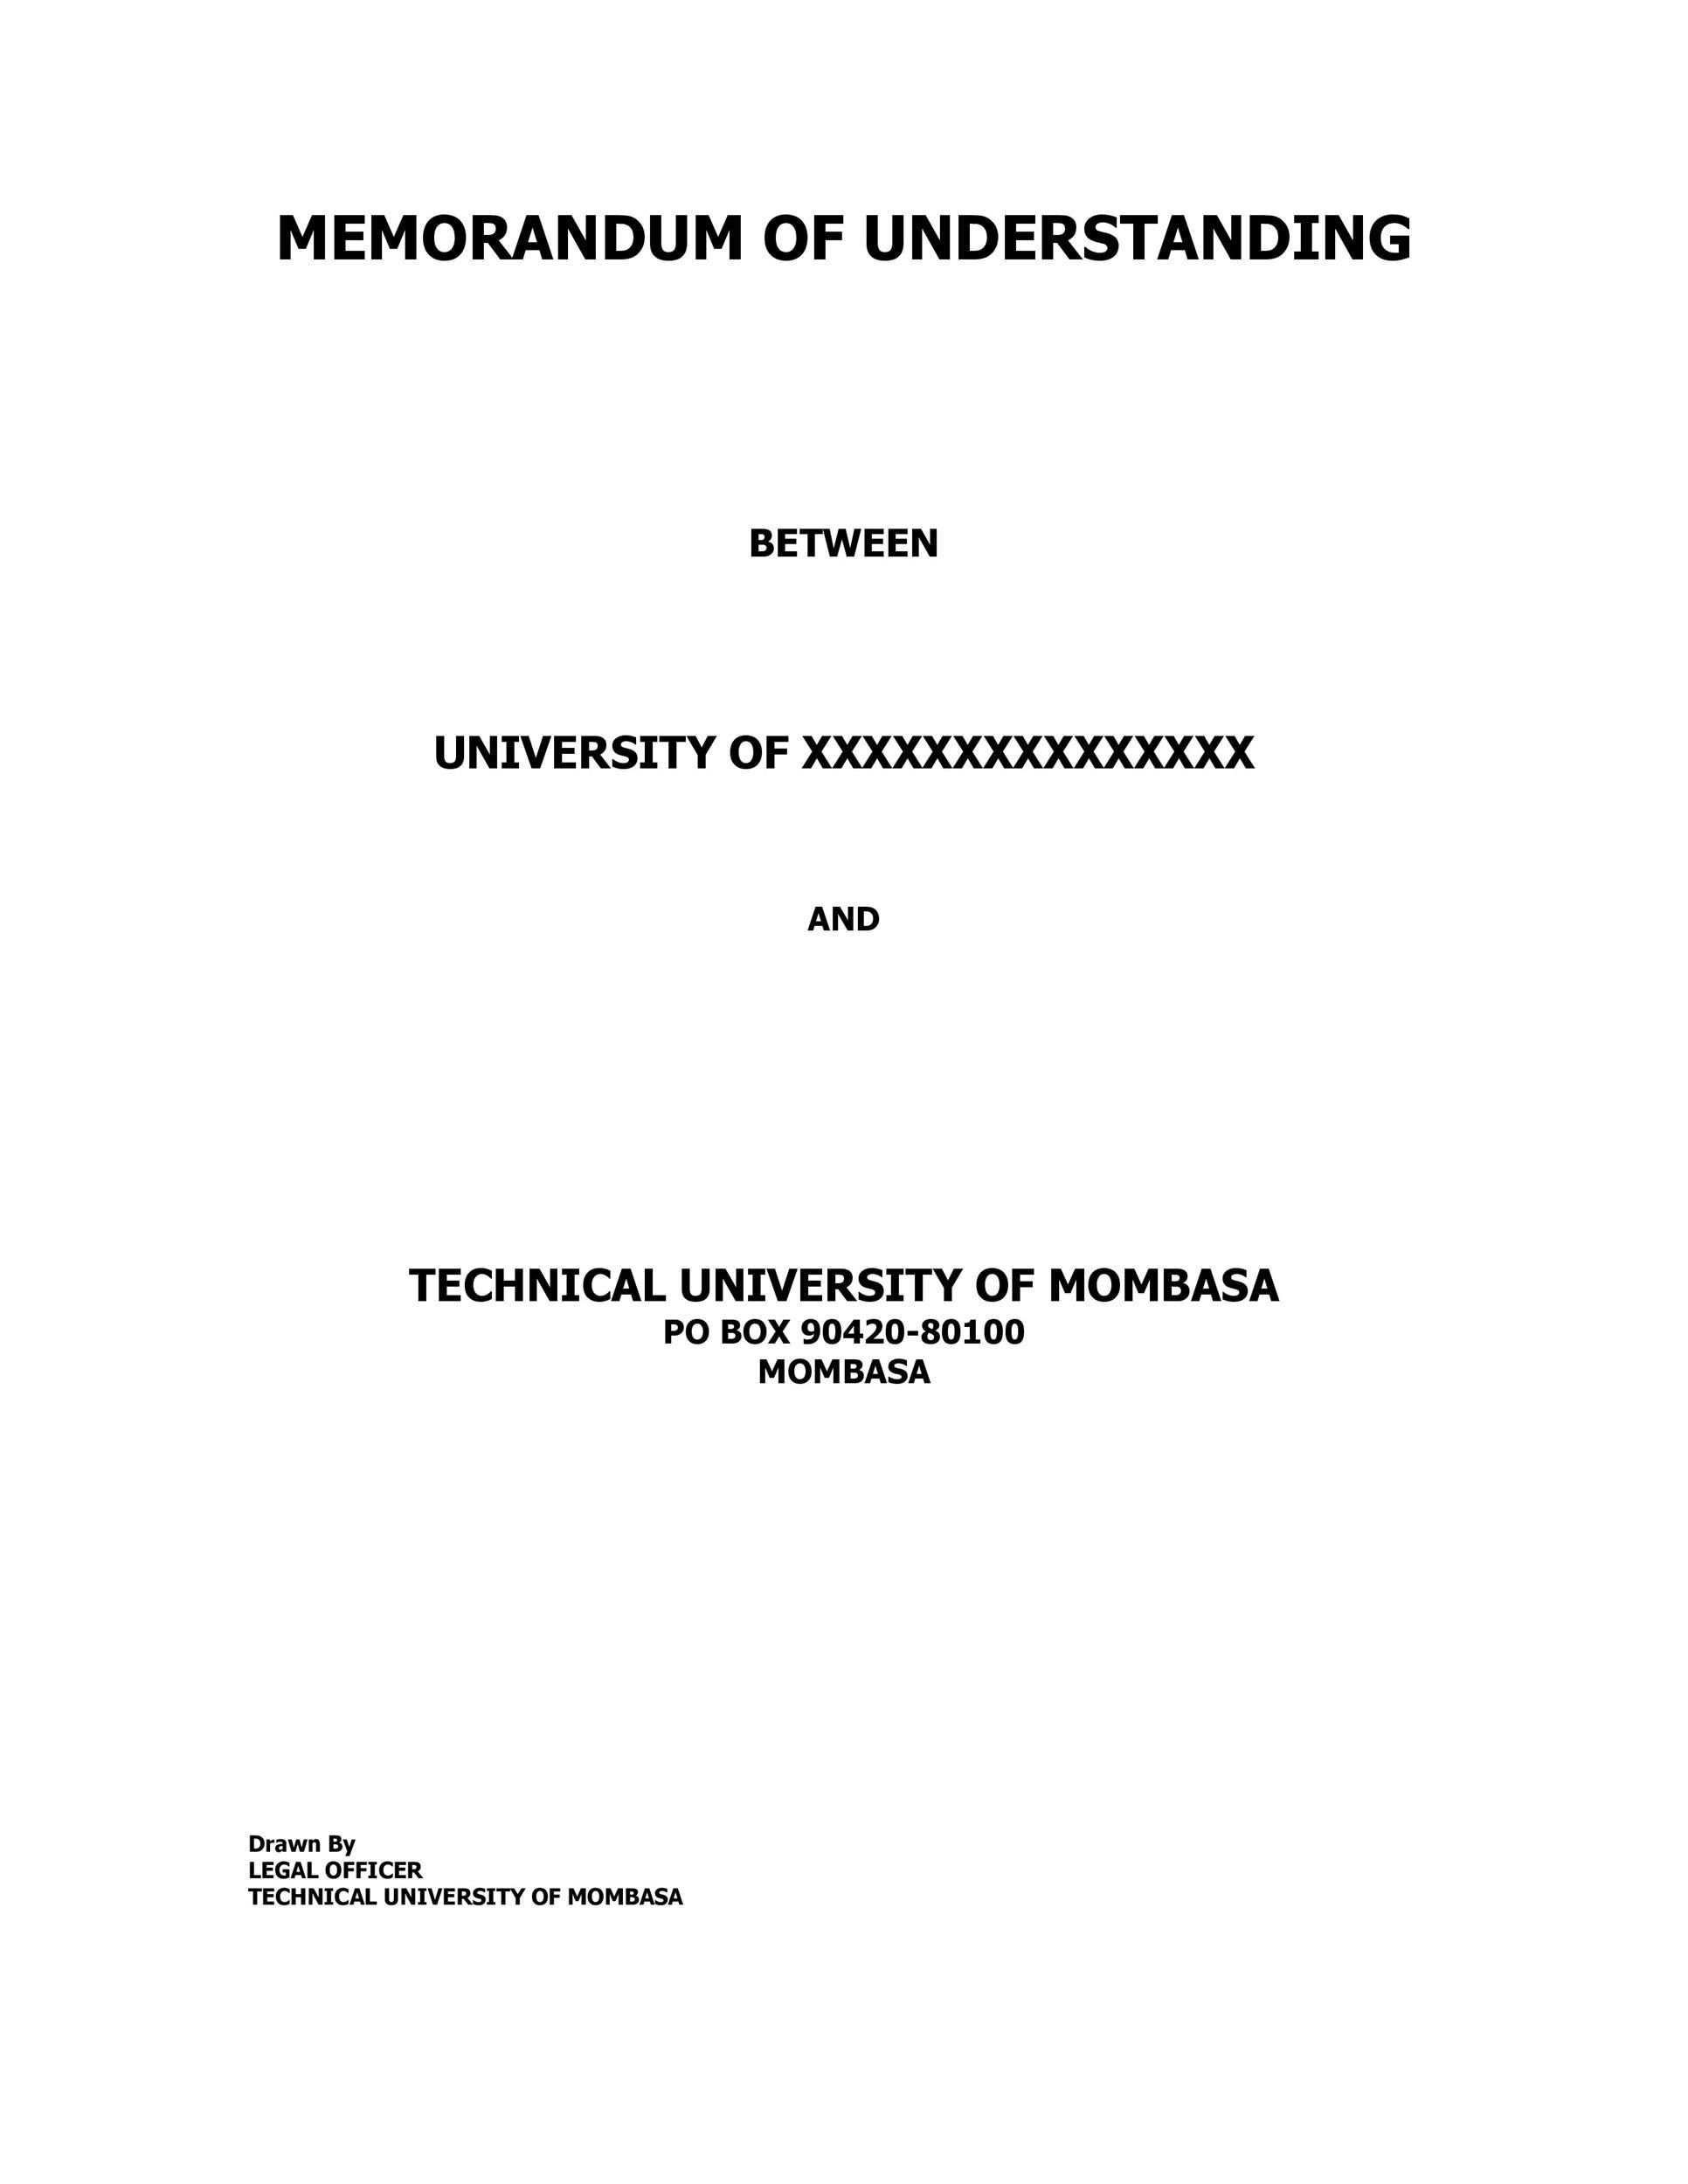 Free Memorandum of Understanding Template 13